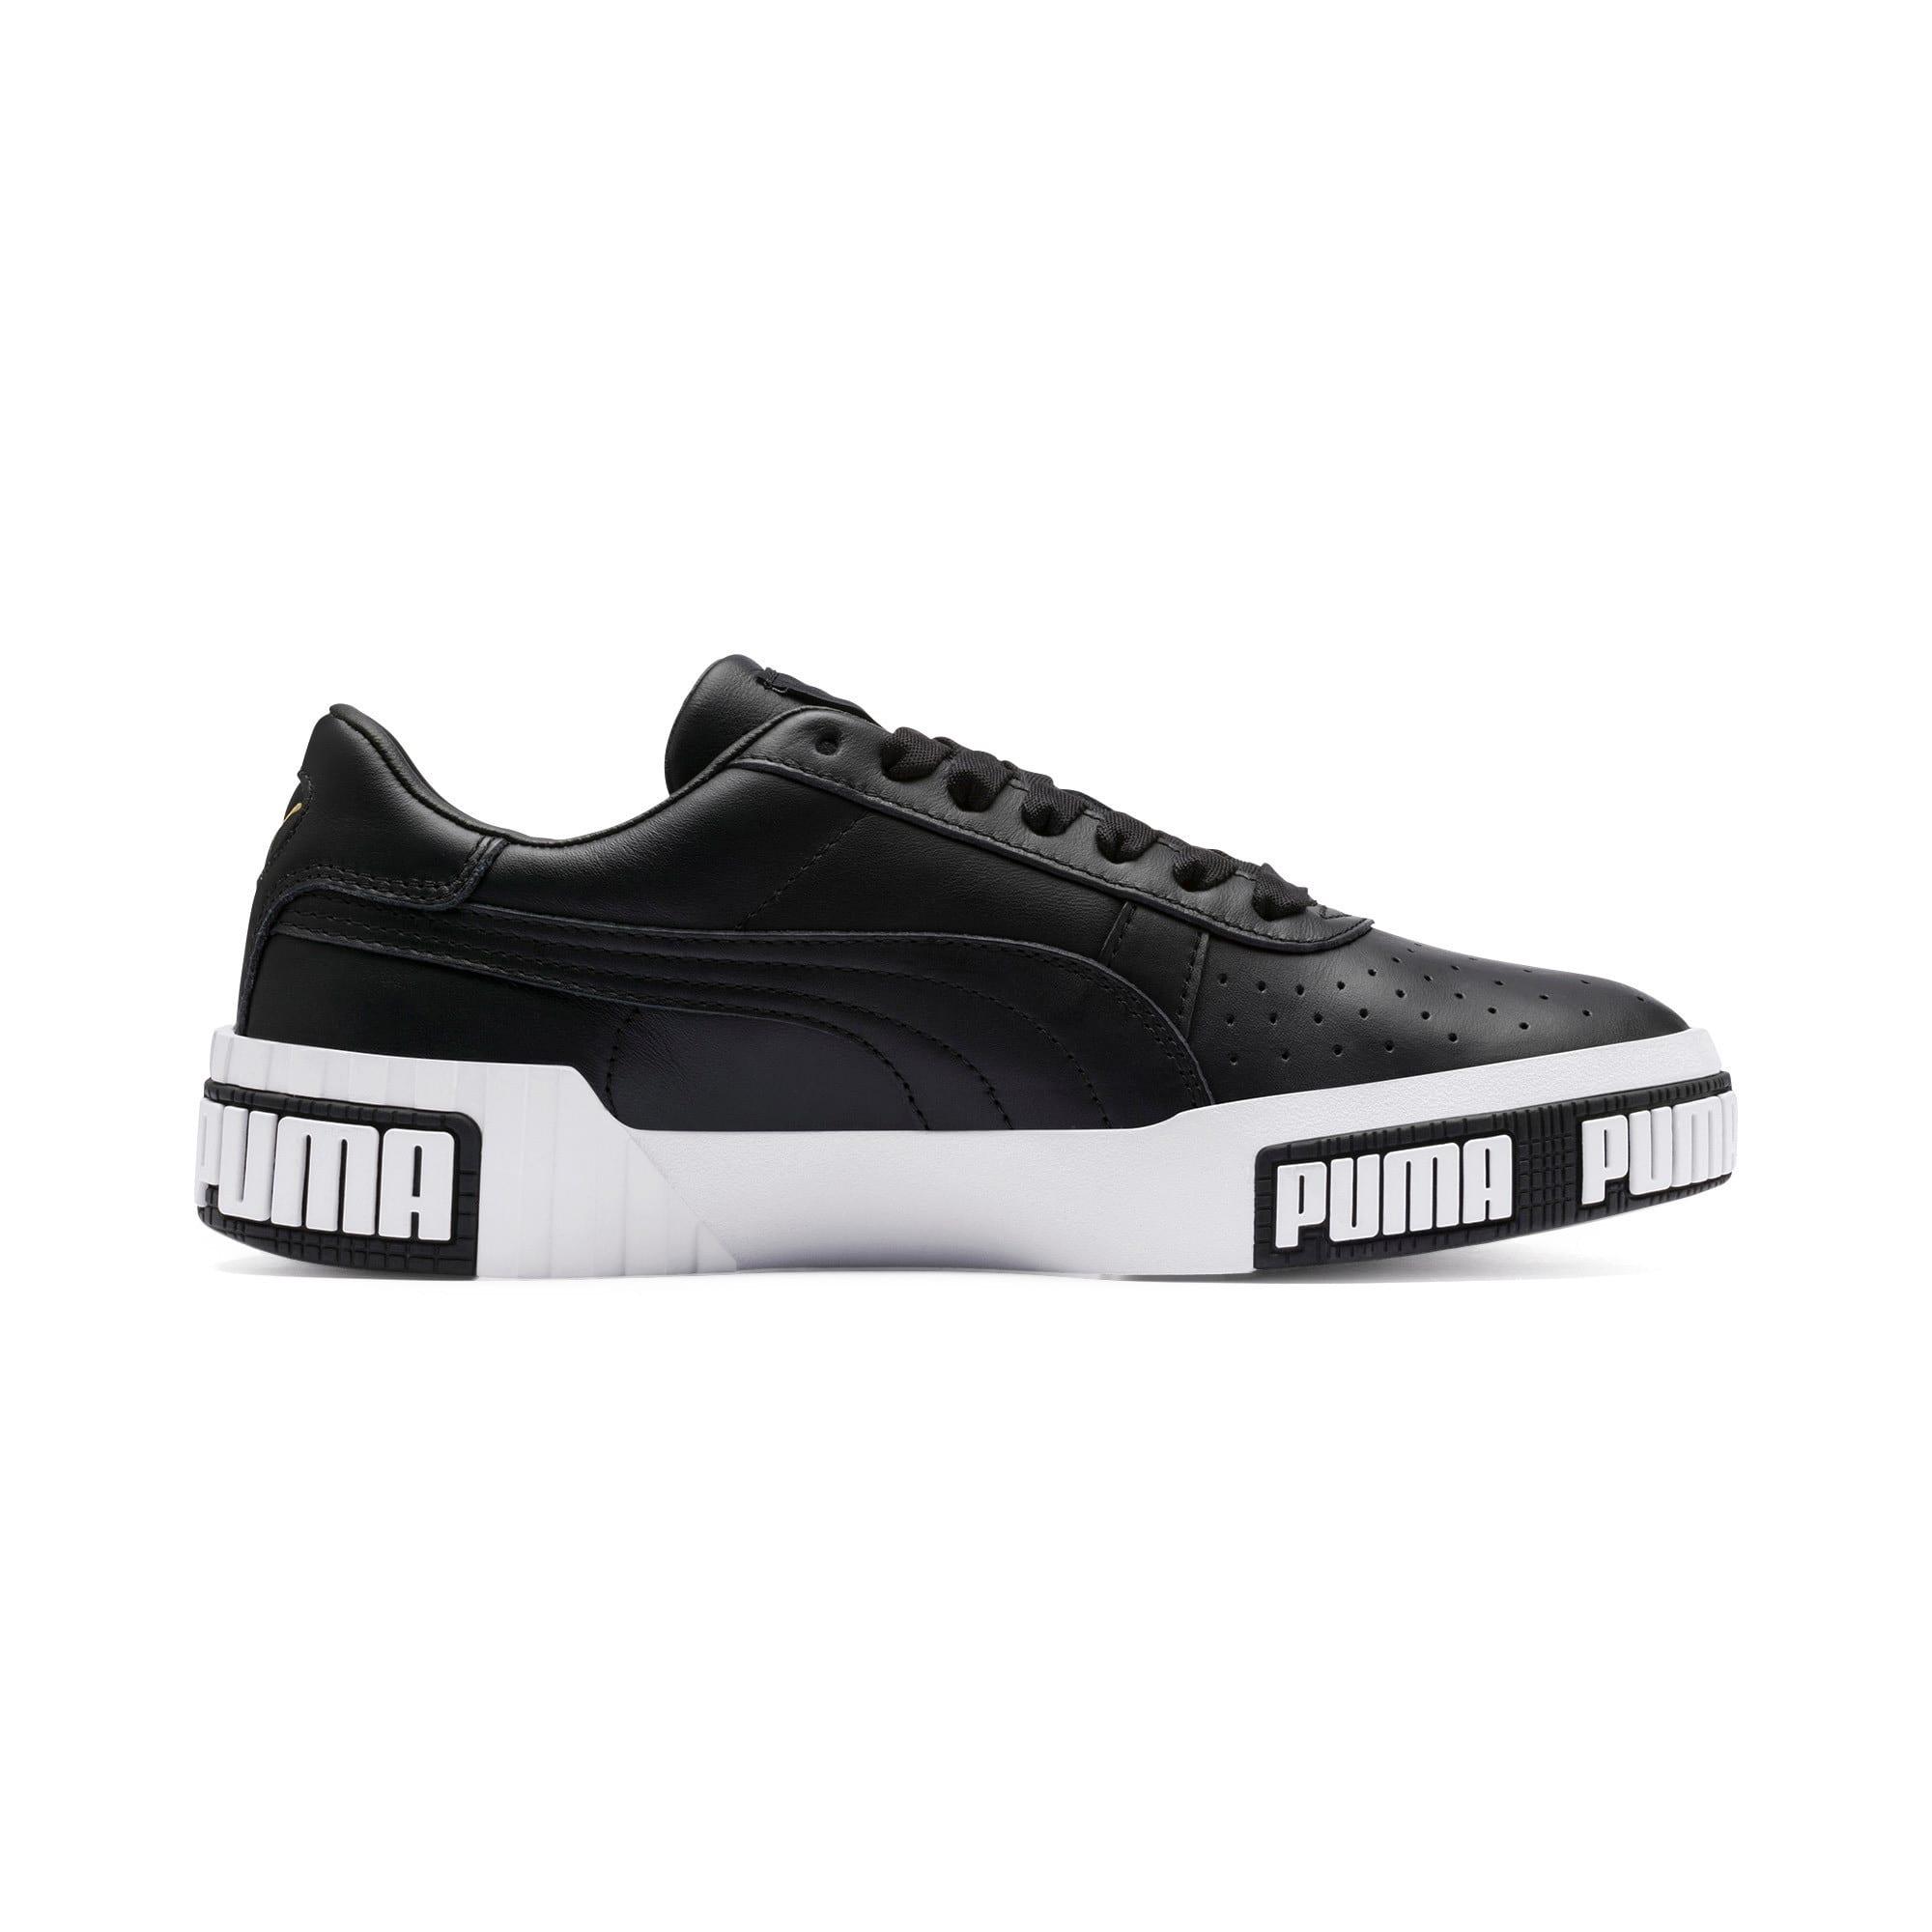 Thumbnail 7 of Cali Bold Women's Sneakers, Puma Black-Metallic Gold, medium